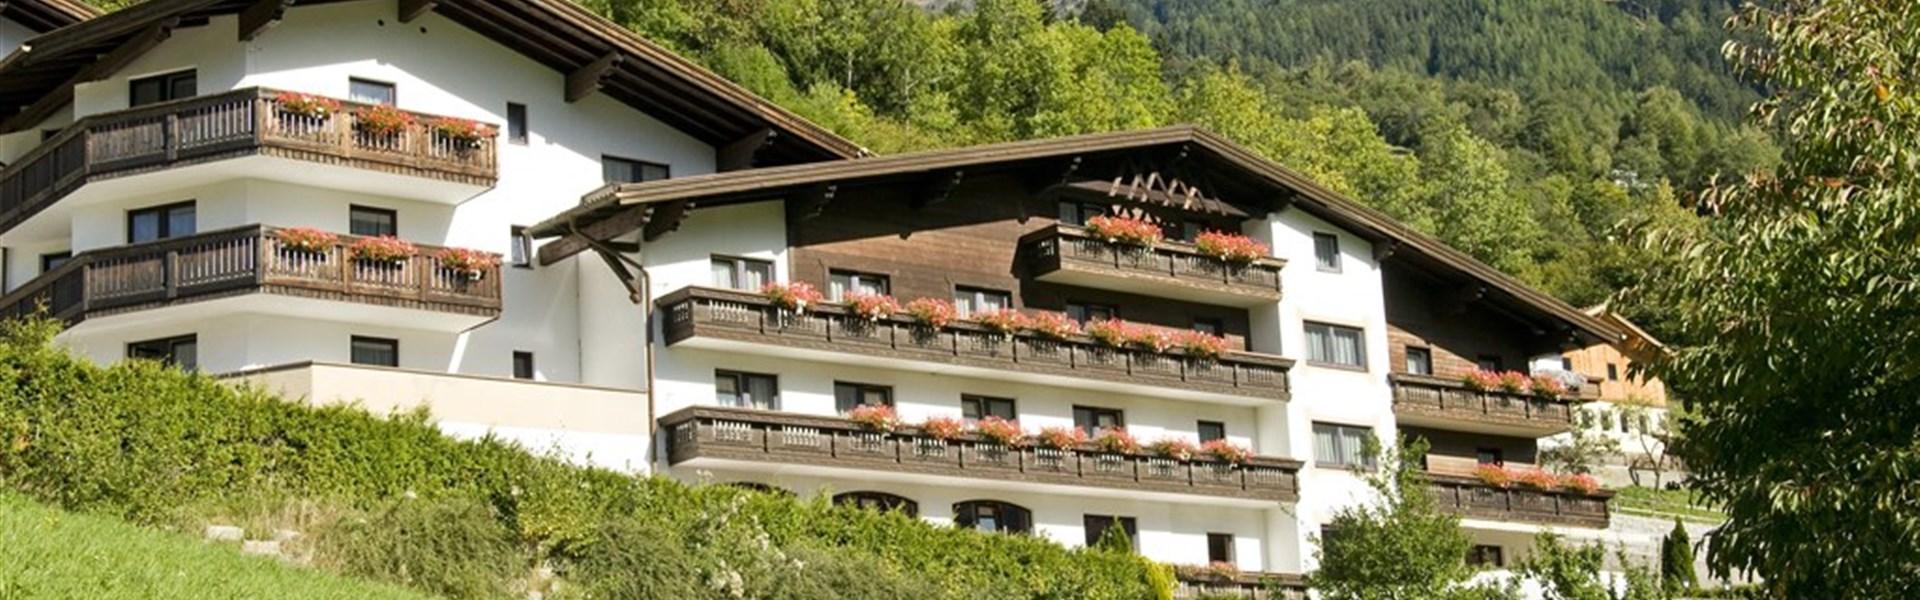 Hotel Alpenfriede -